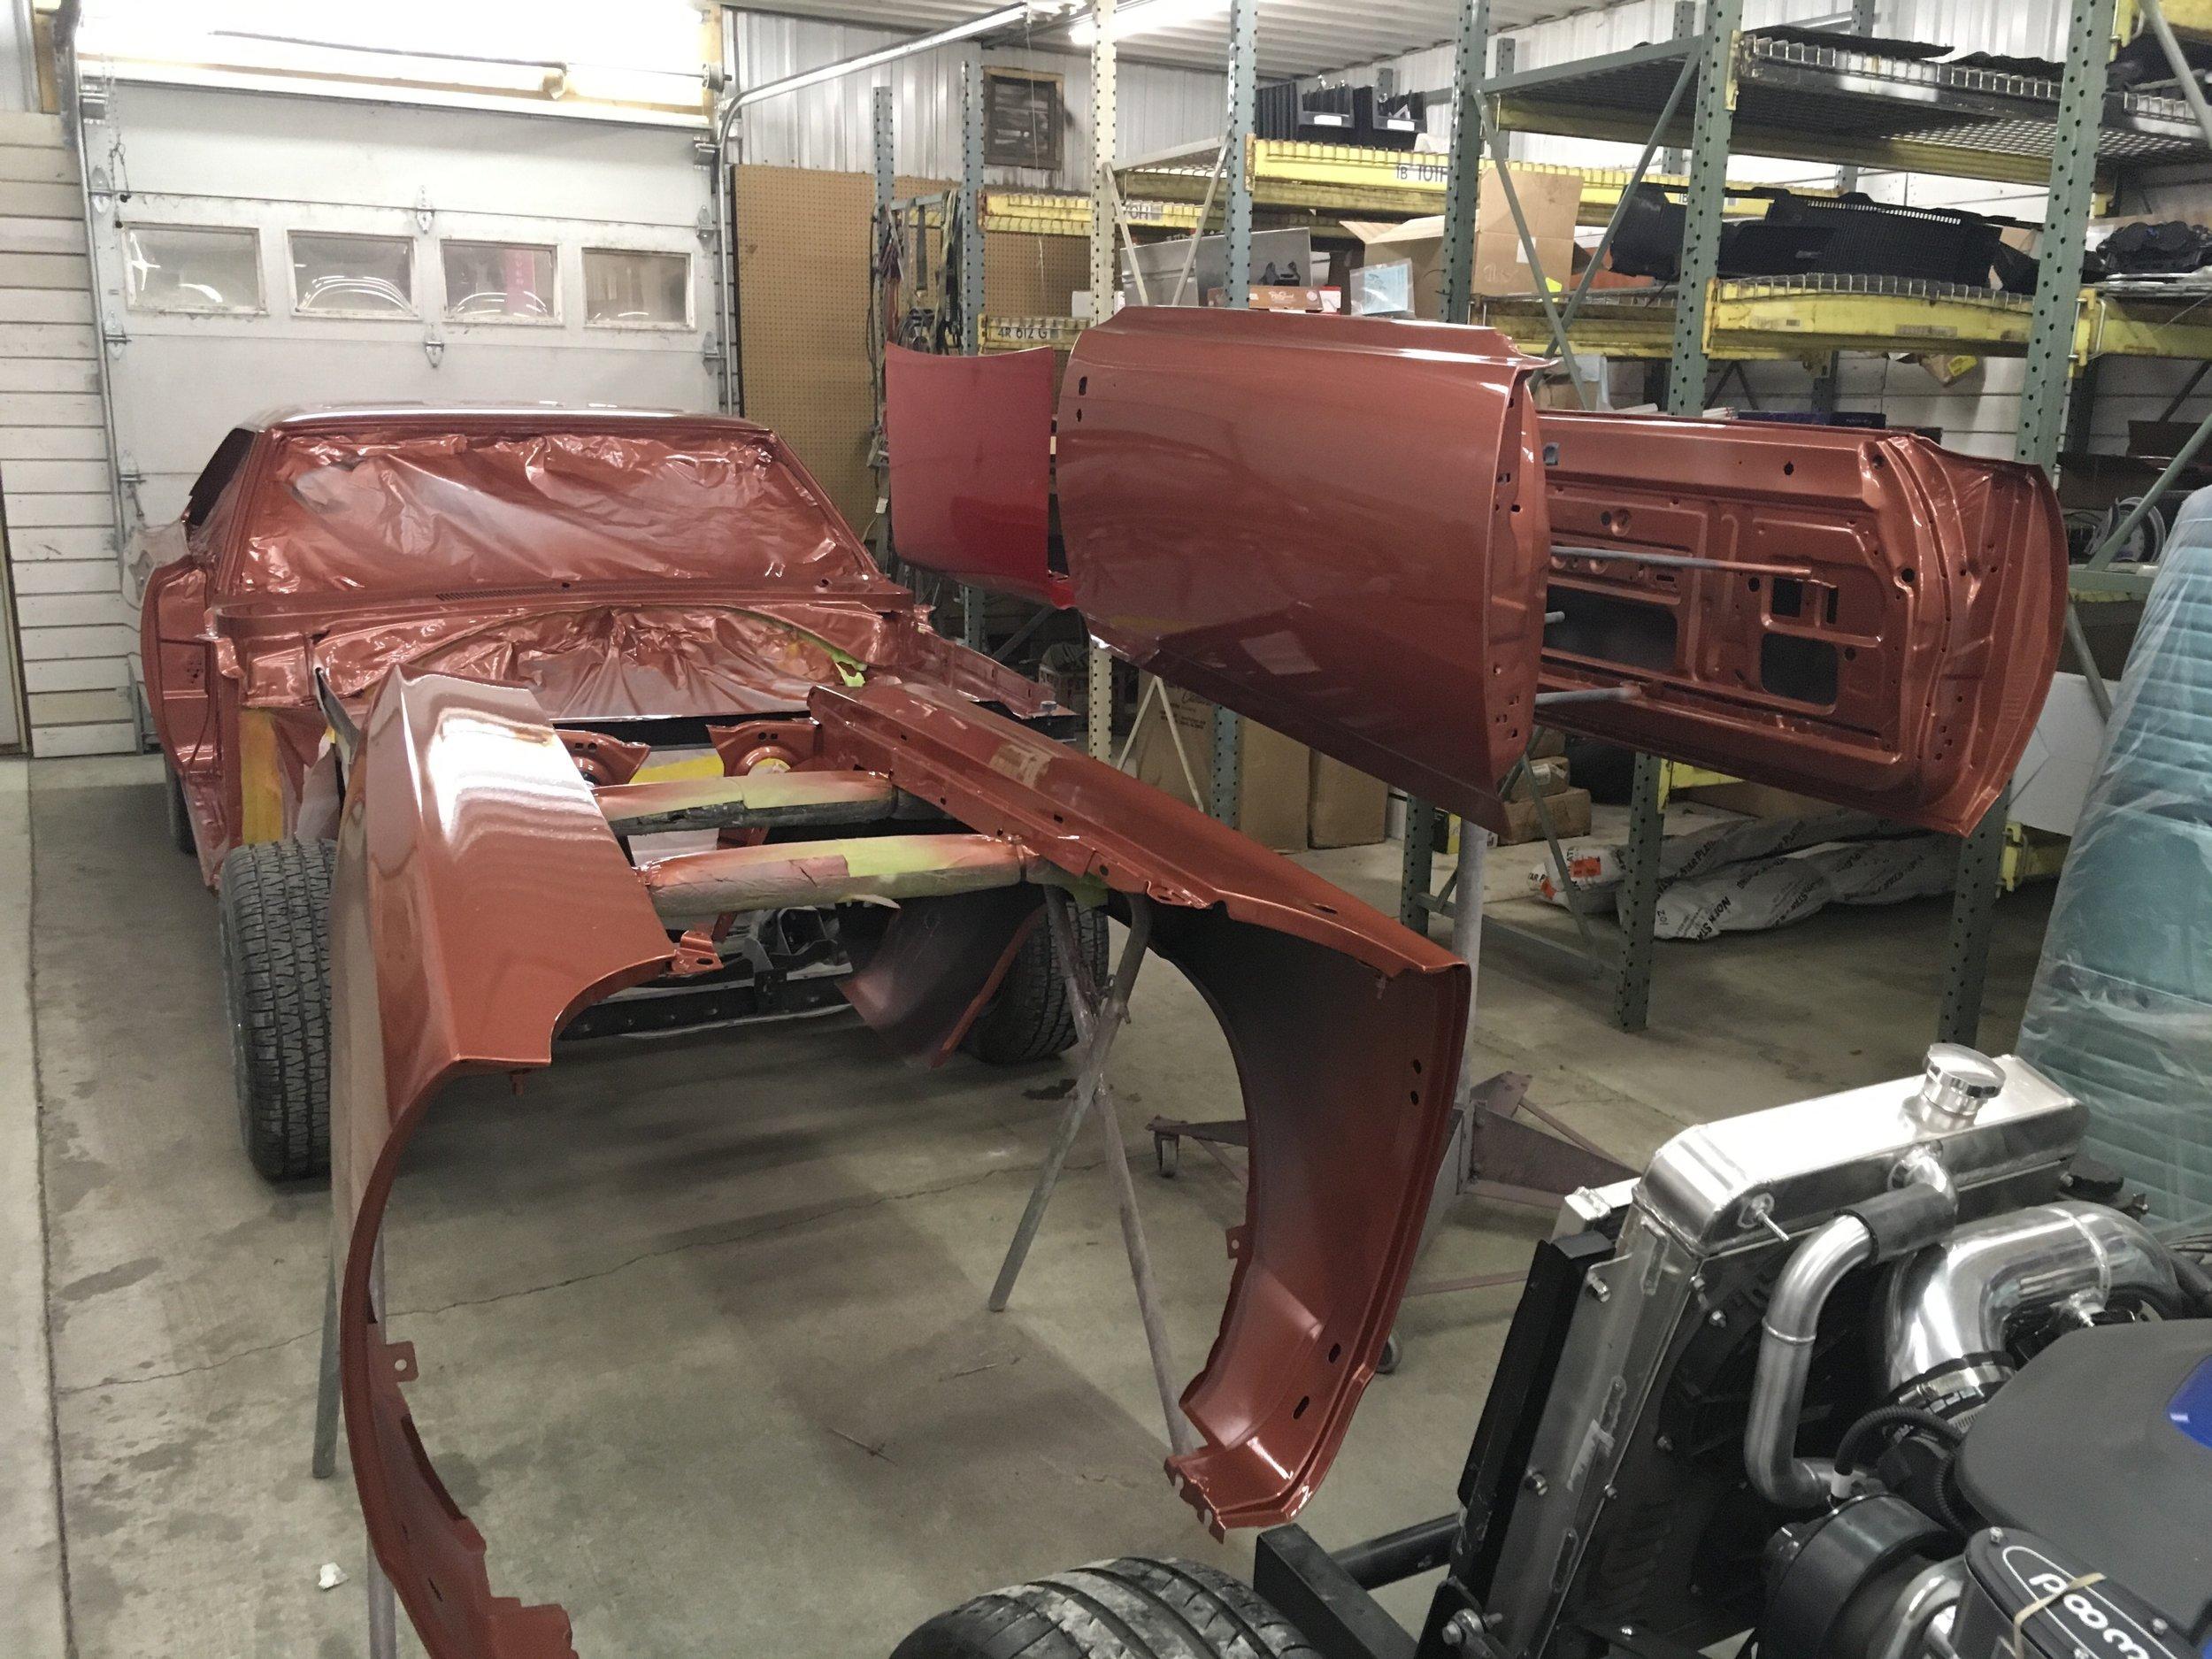 image.jp1968-Plymouth-GTX-minneapolis-custom-built-hot-rod-restoration-body-work-and-painting.jpg